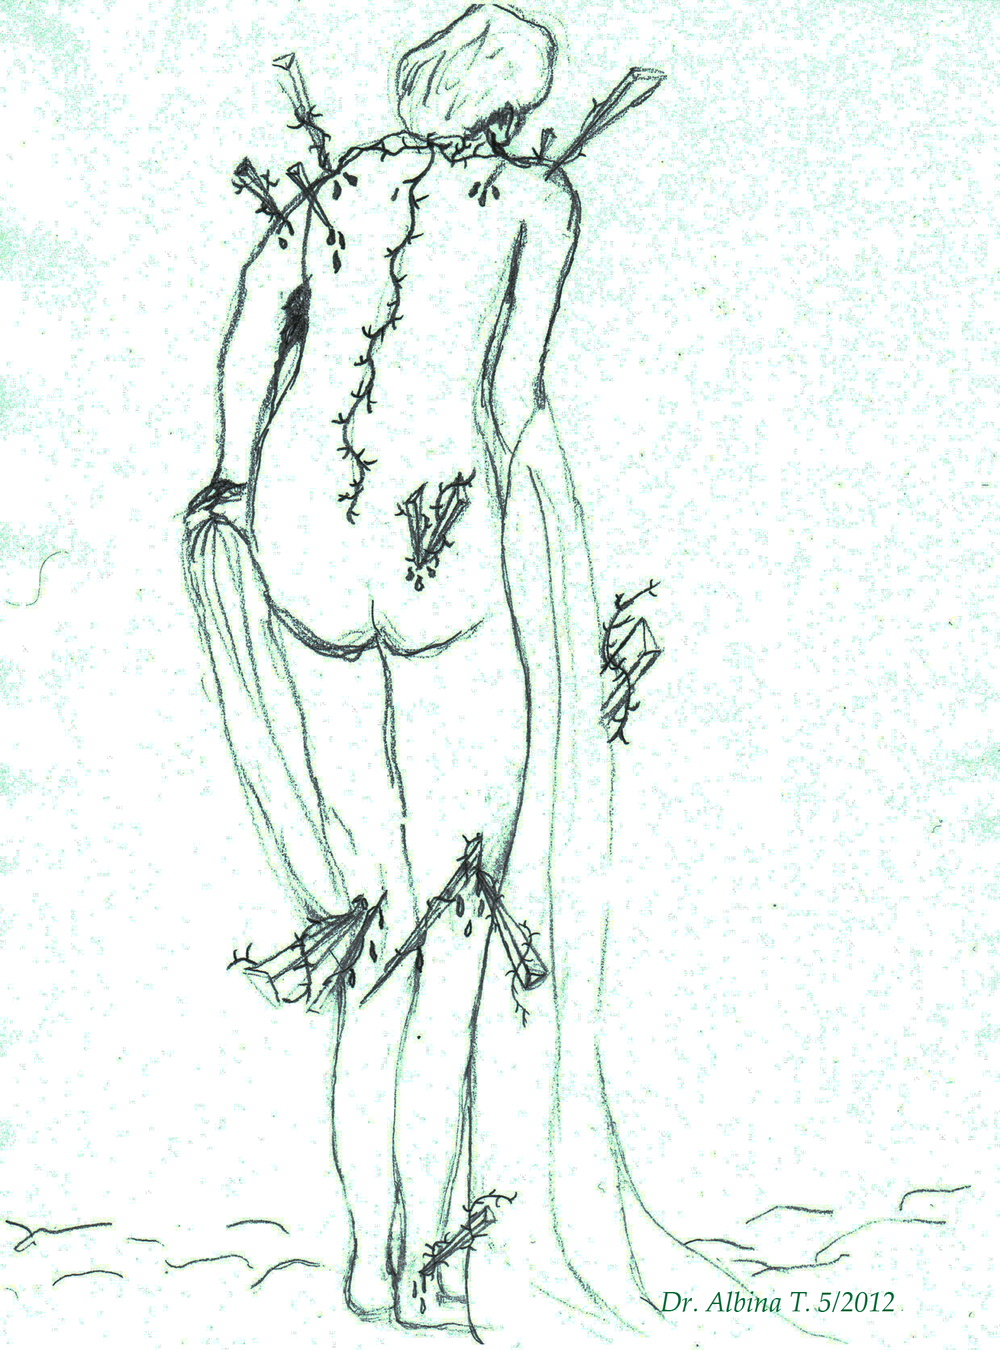 albina_pain_2012.png